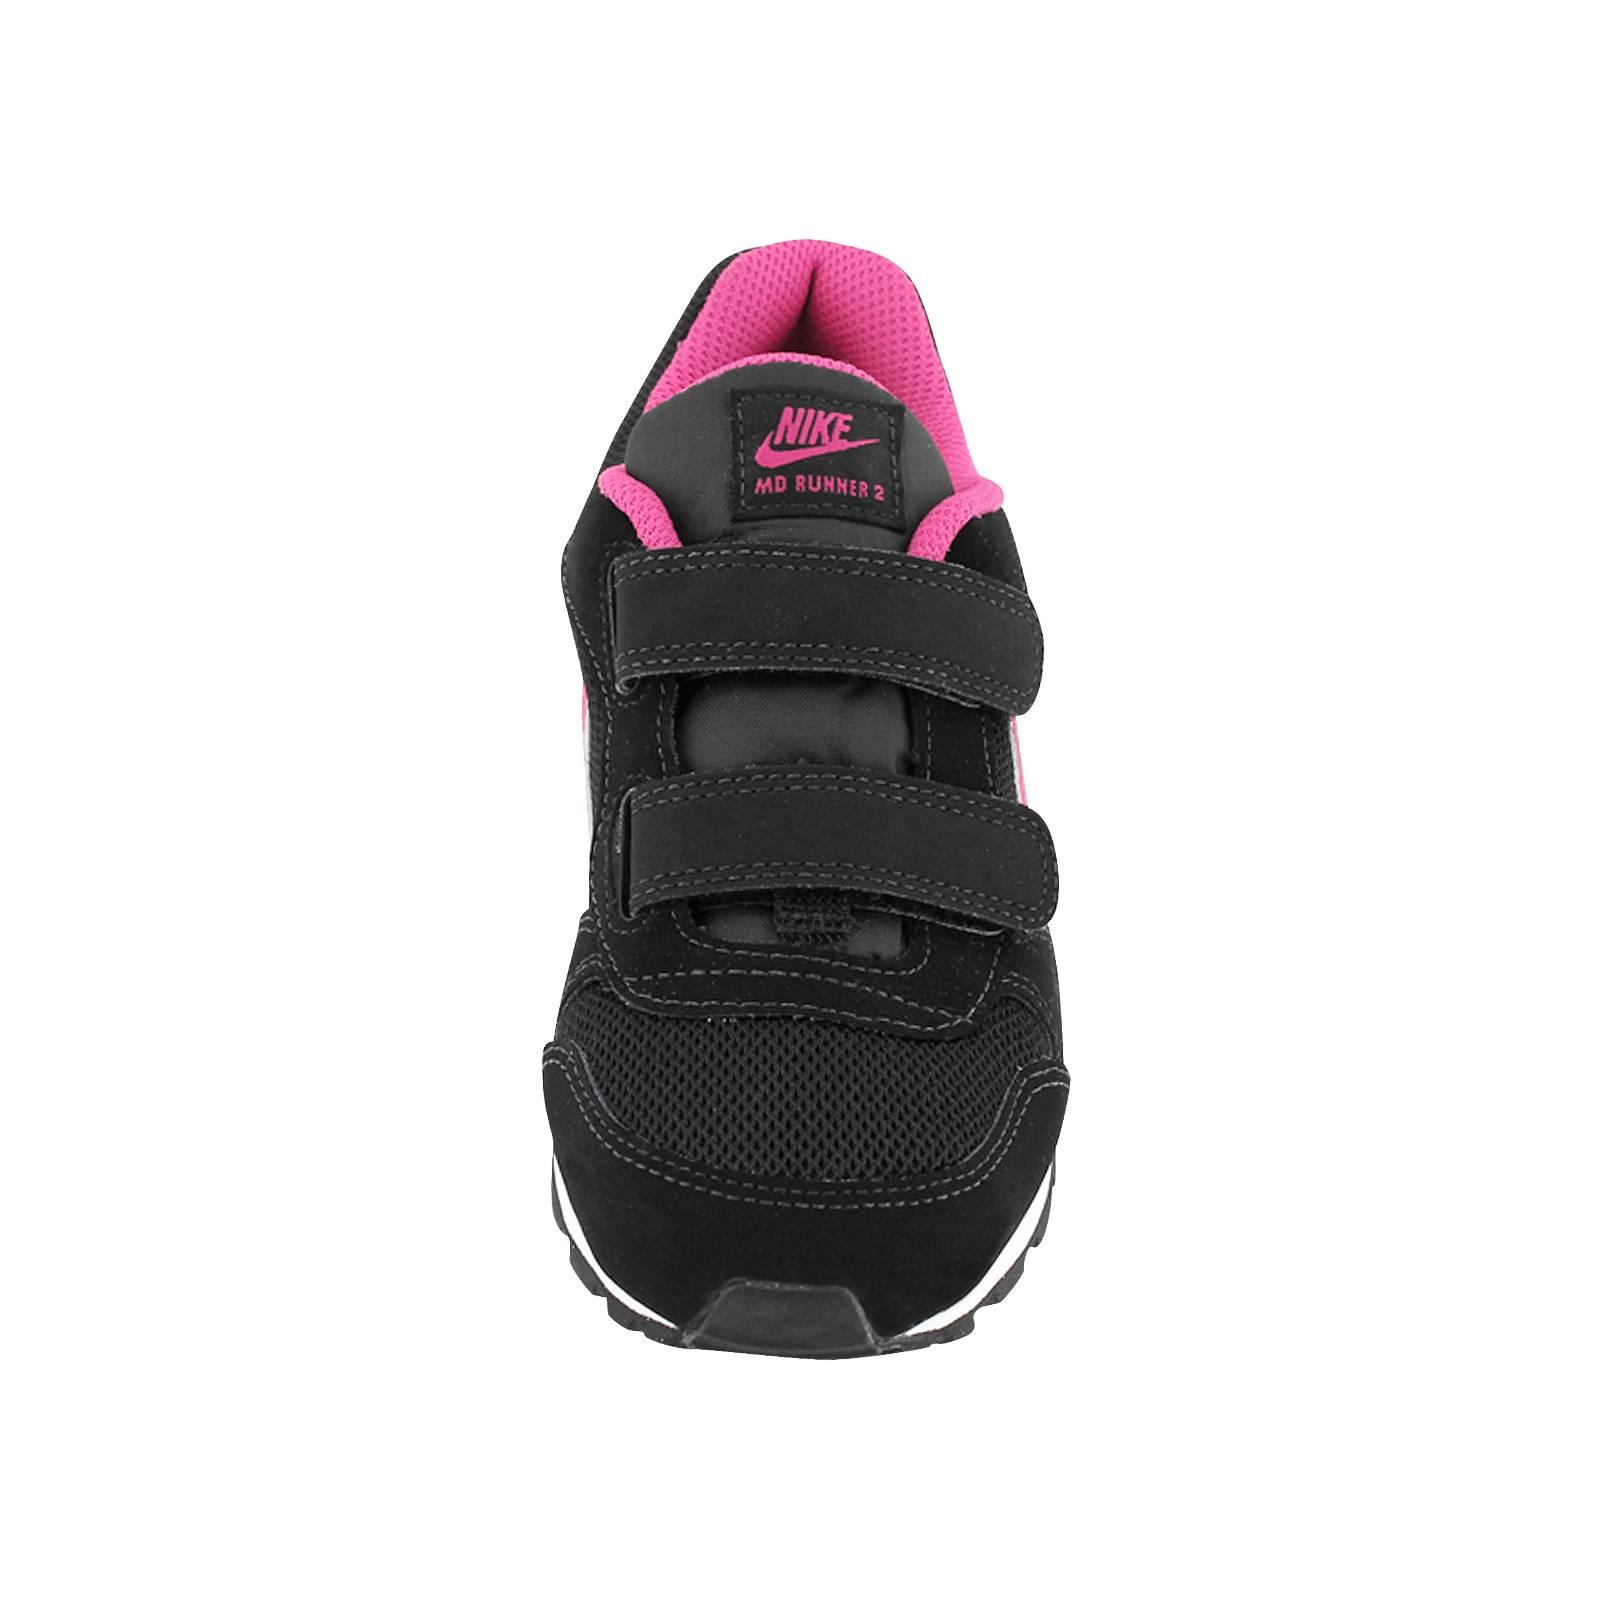 MD Runner 2 PSV - Παιδικά αθλητικά παπούτσια Nike από nubuck 2b1e7bdddb1